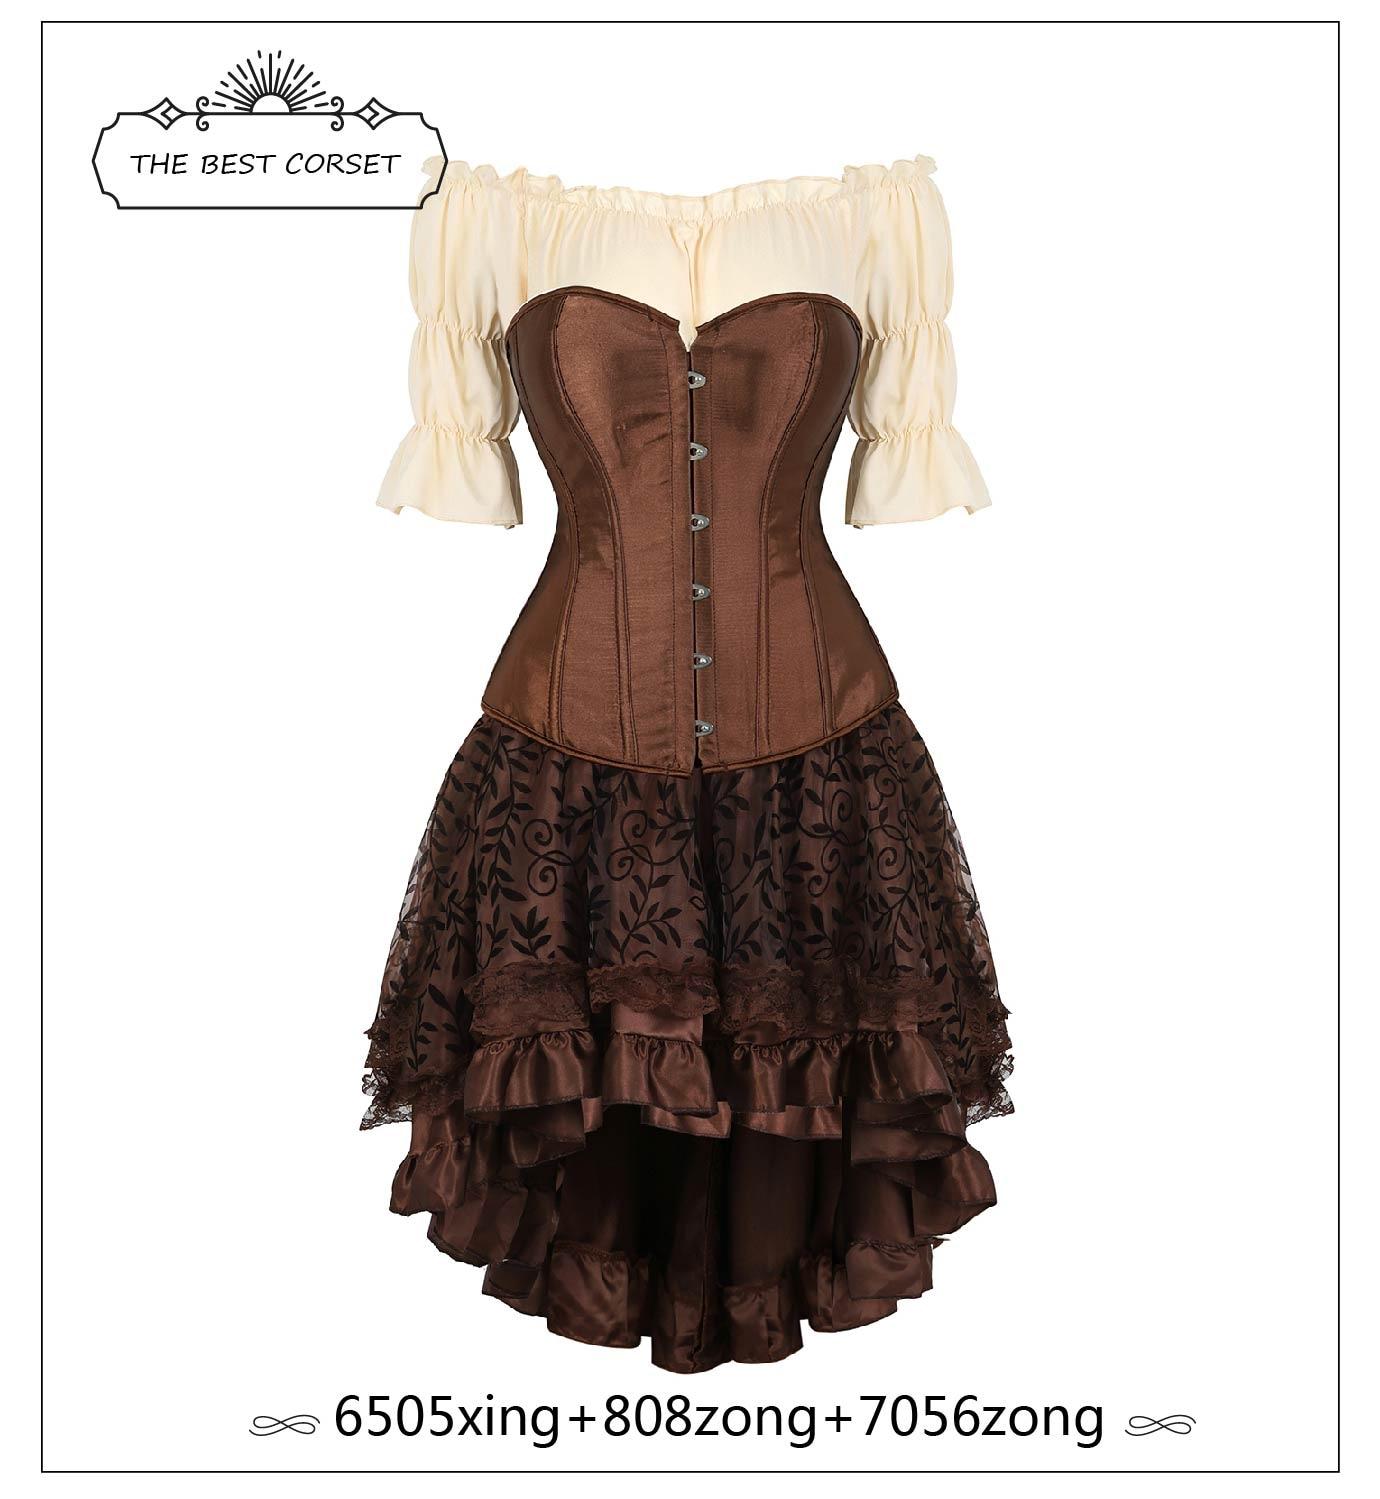 Steampunk Corset Dress  Renaissance Gothic Corset Vintage Dress Faux Leather Corset Skirt Tops 3 Piece Cosplay Costume